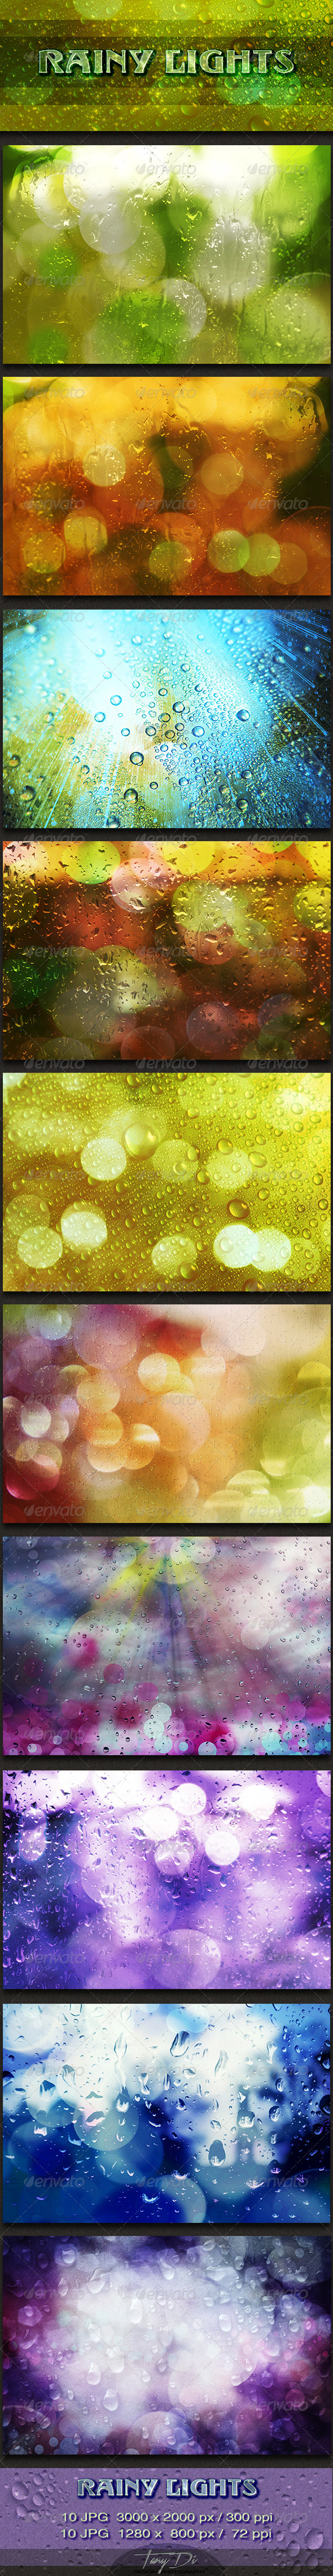 GraphicRiver Rainy Lights 3770732